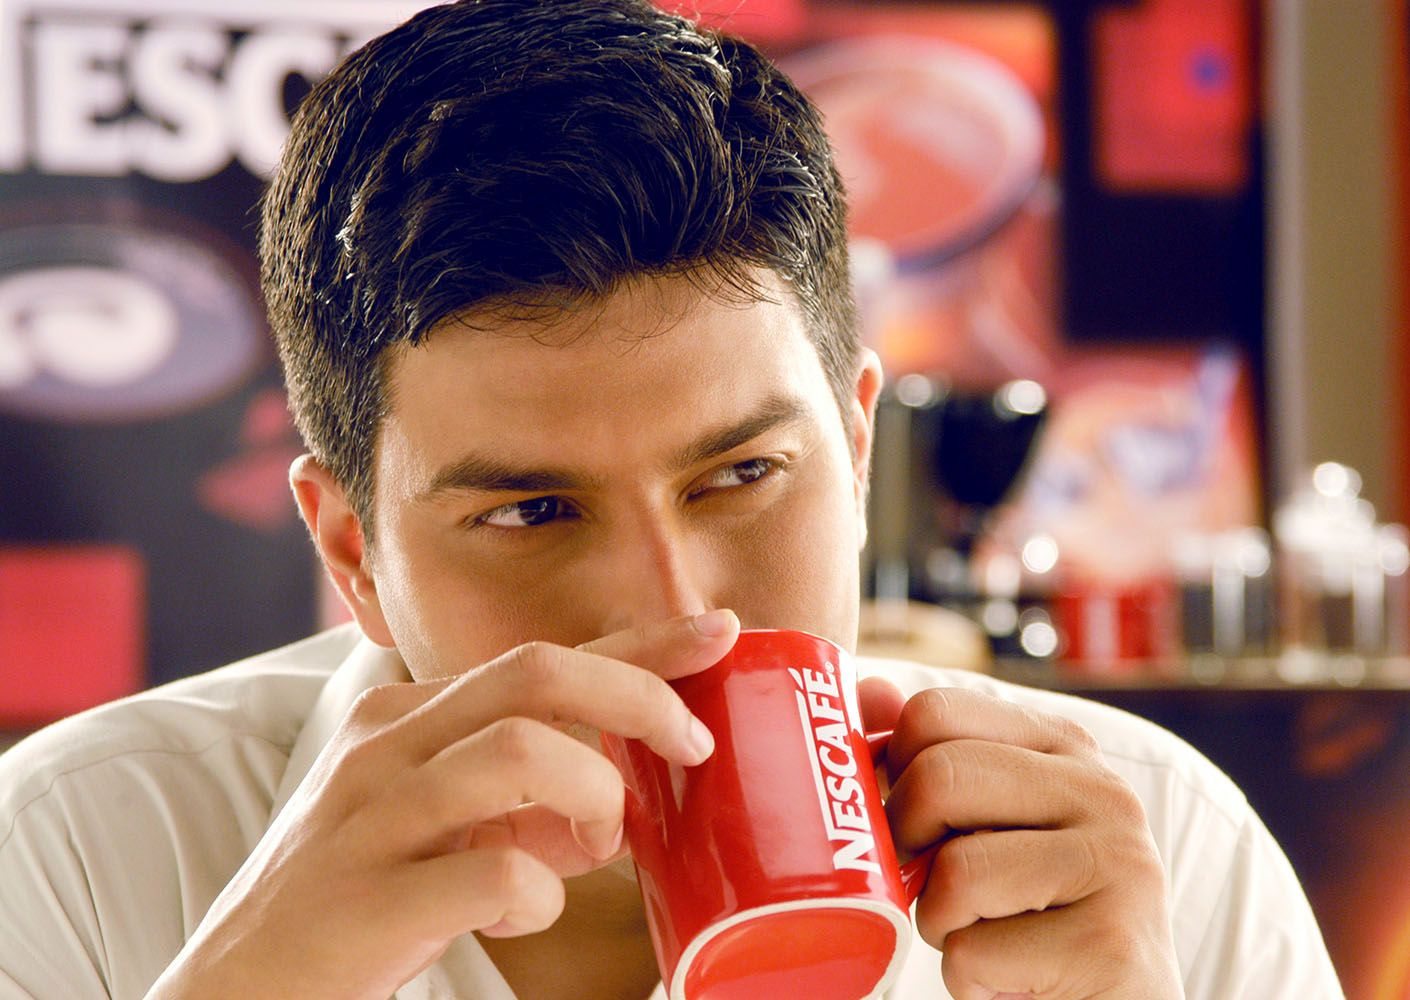 Nescafe2a 2Y.jpg